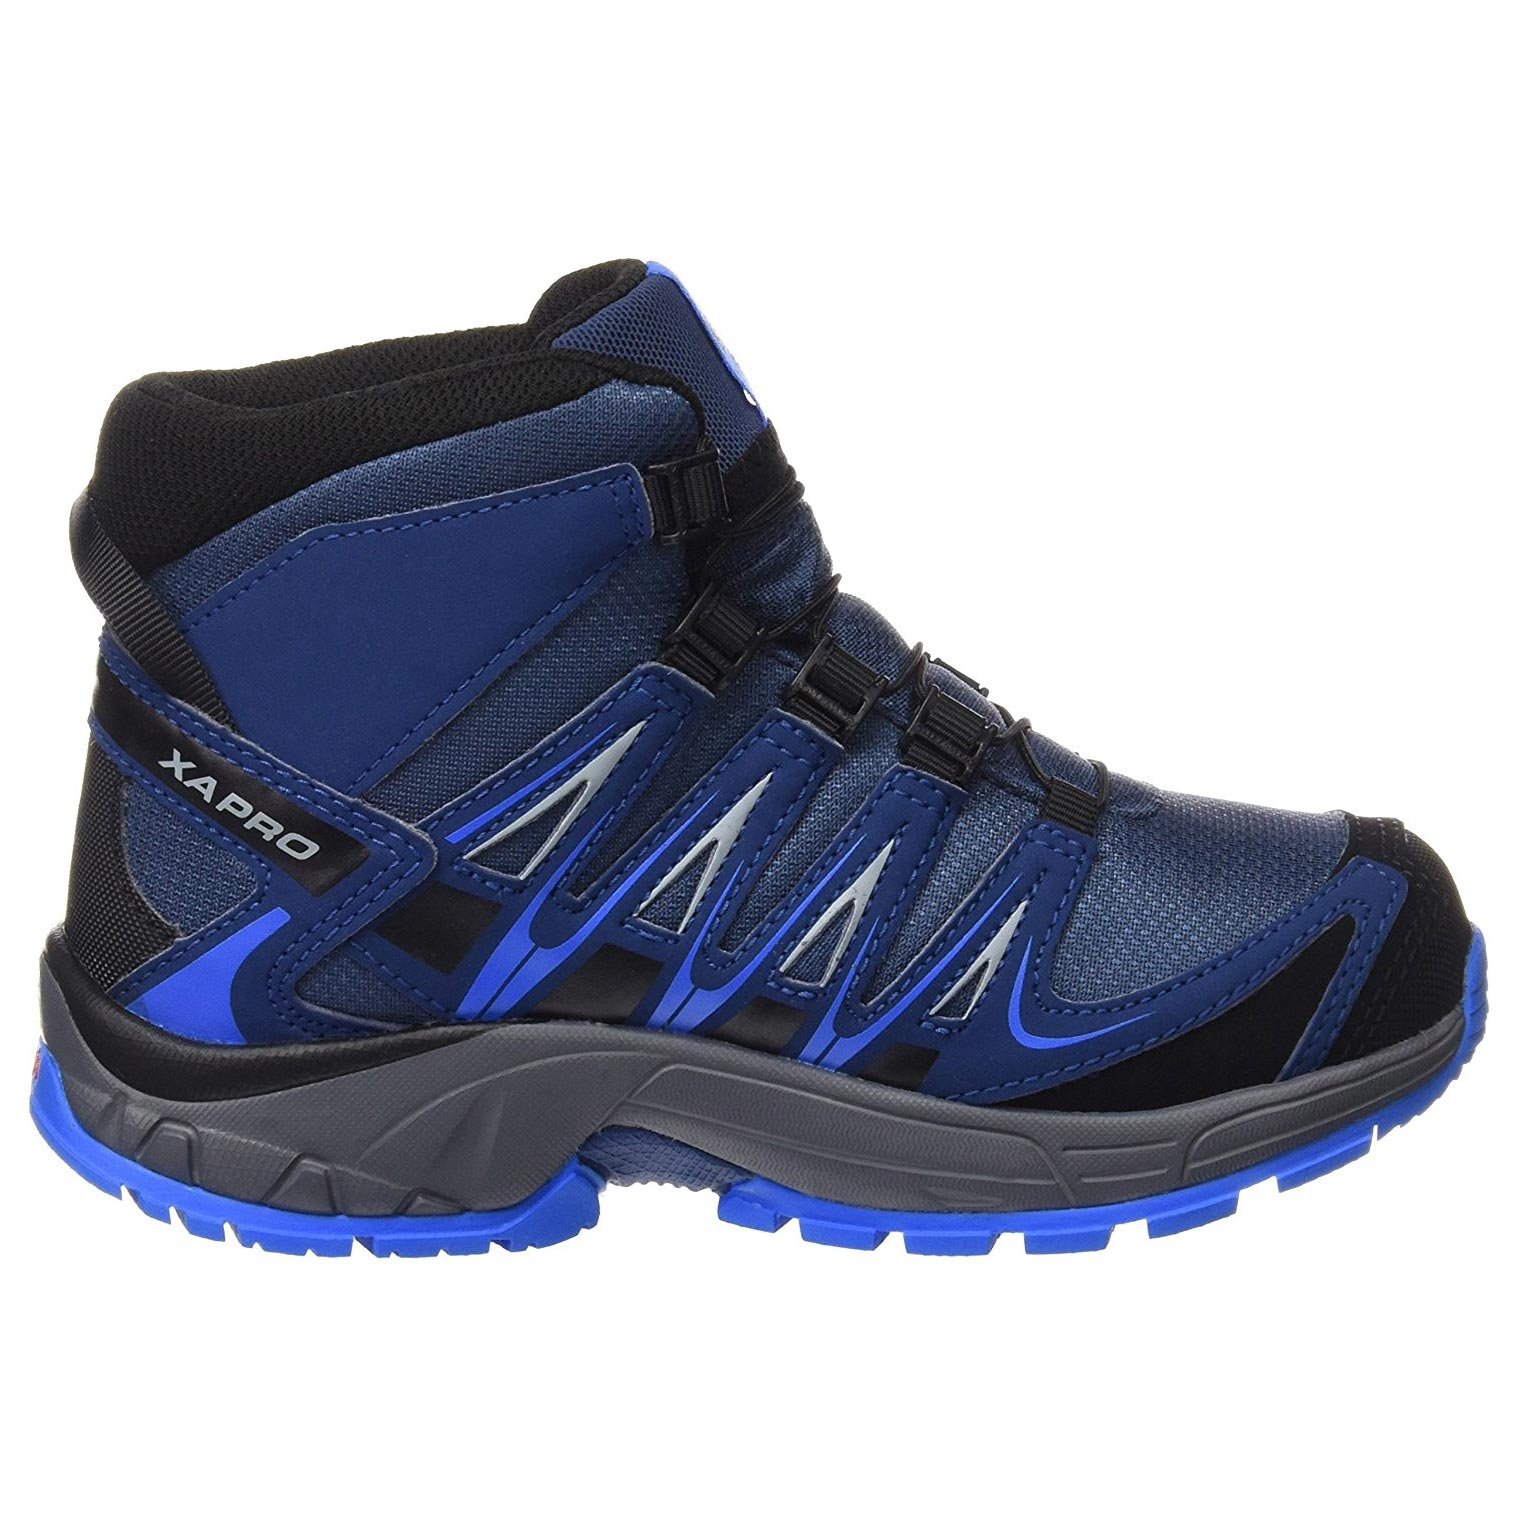 a6059a0d9e Bota Salomon XA PRO 3D MID CSWP J Marino/Azul/Negro